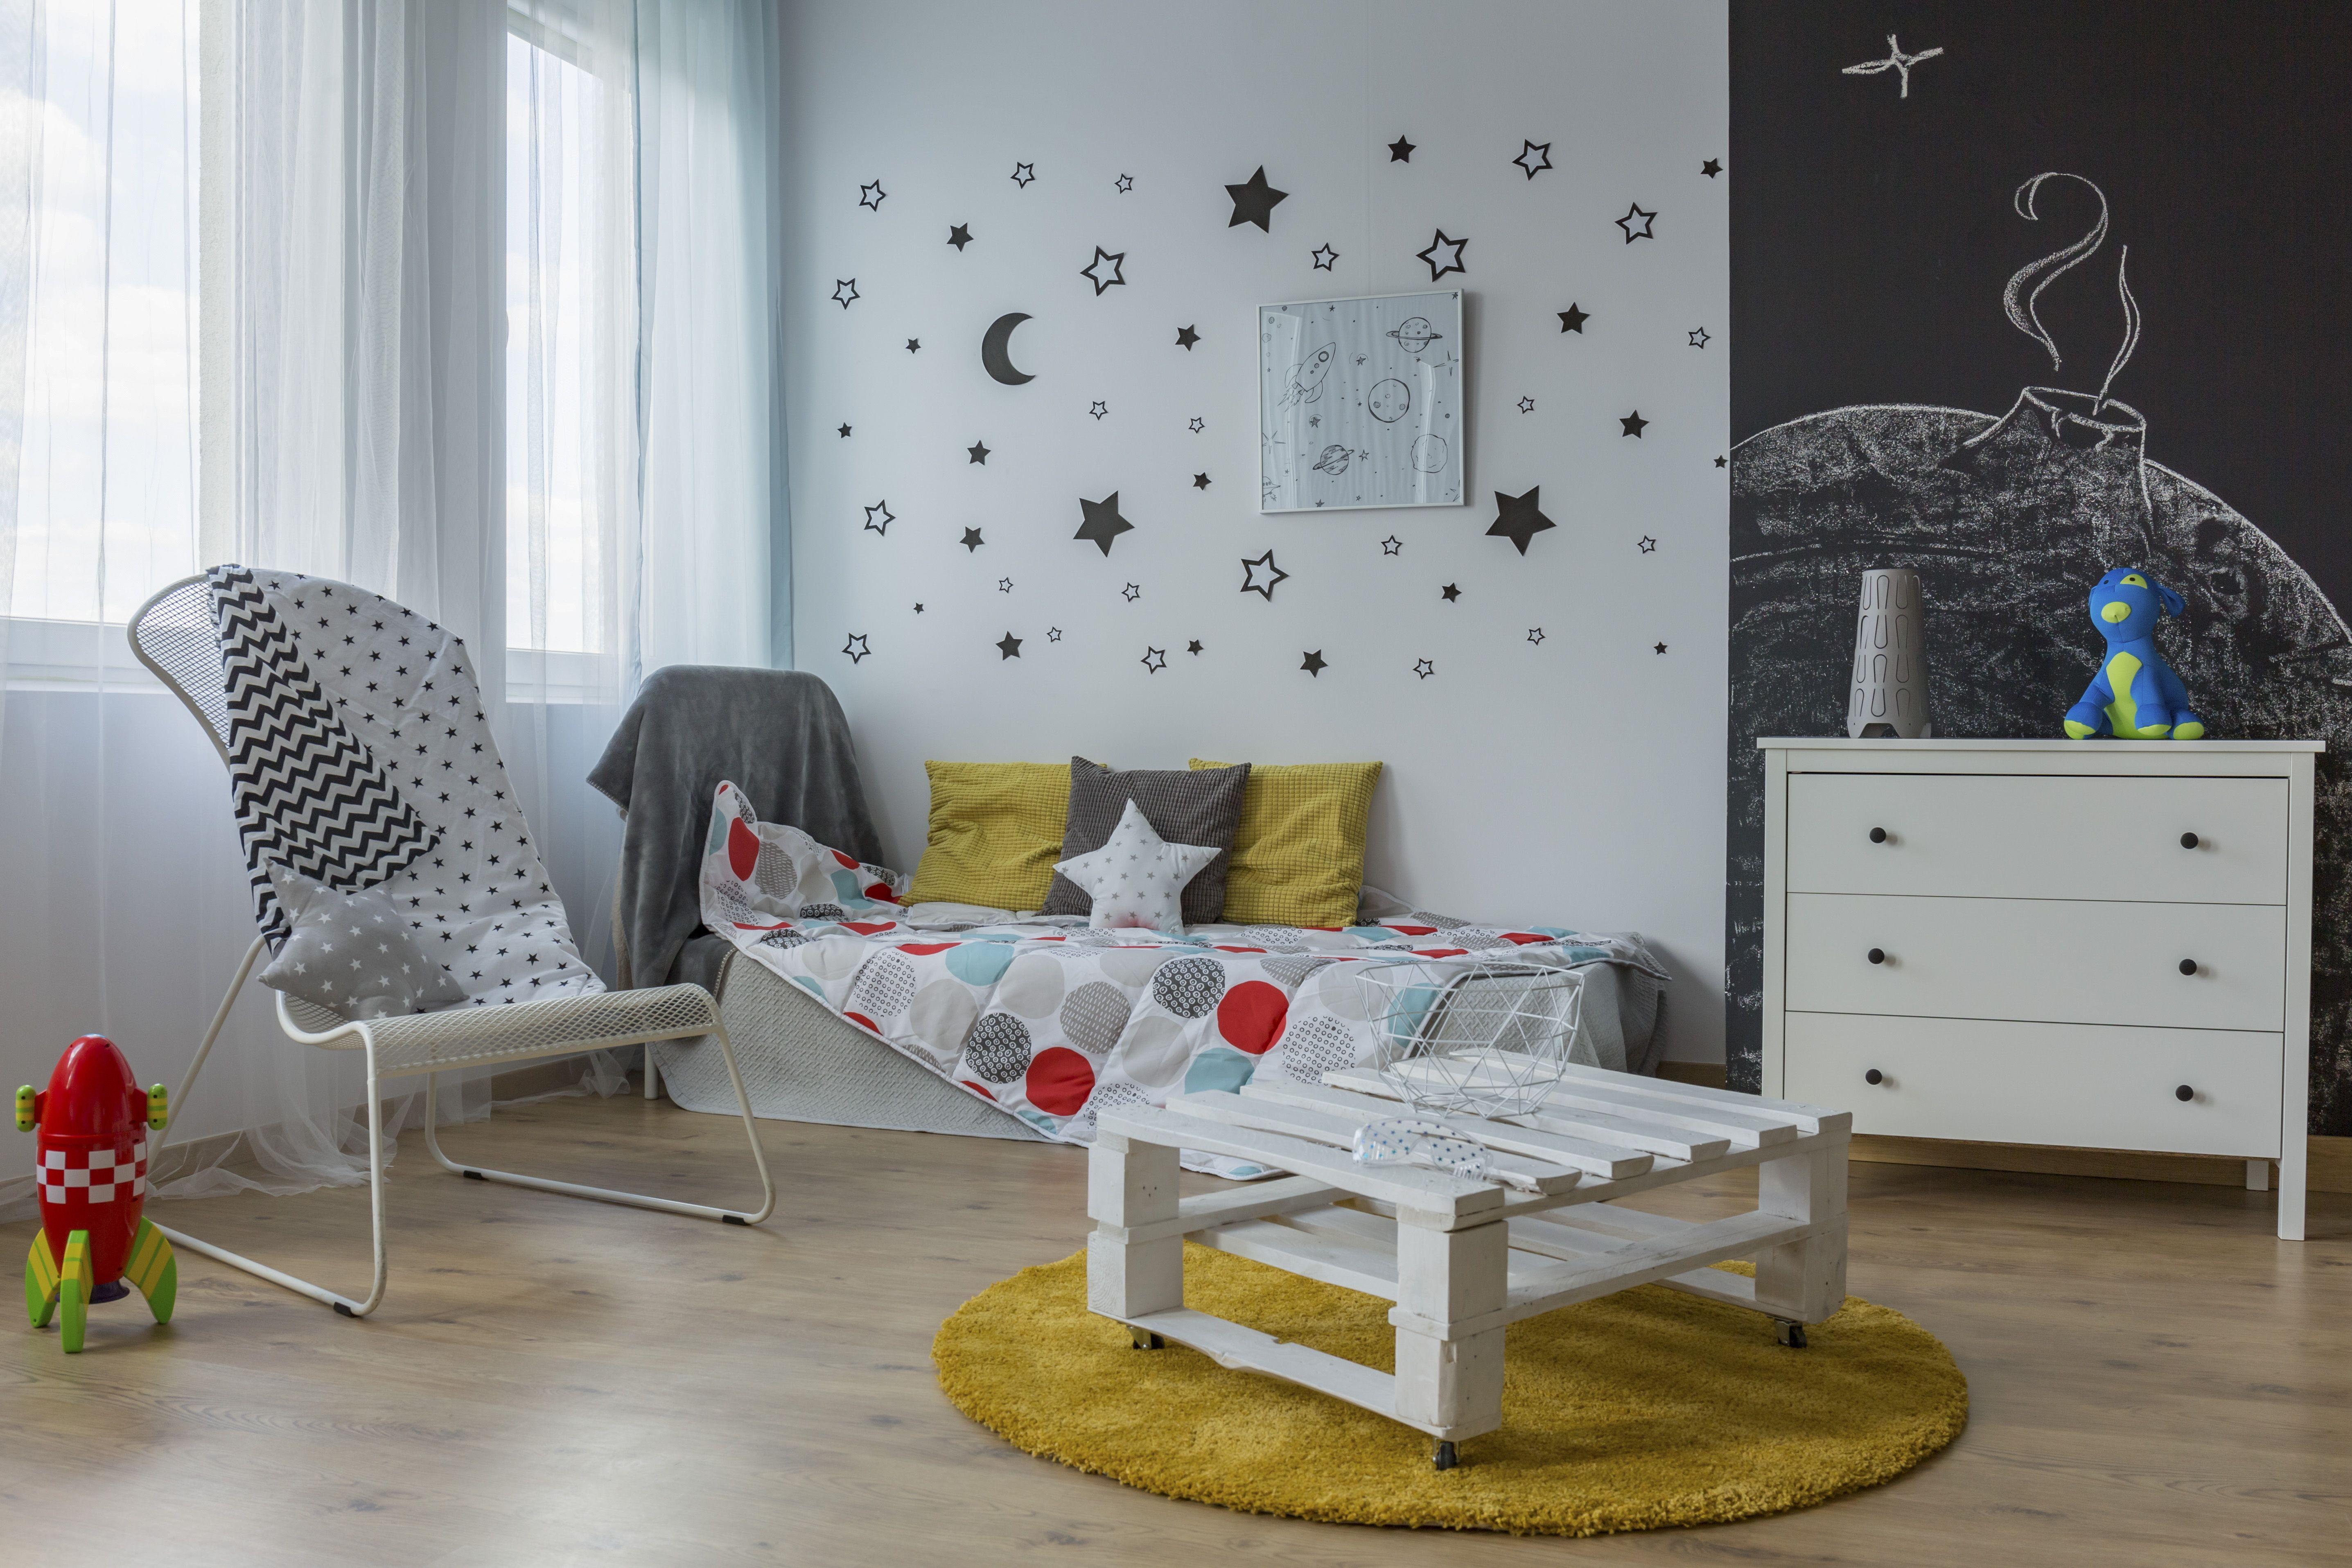 Howus this for a childrenus bedroom theme childrensbedroomtheme